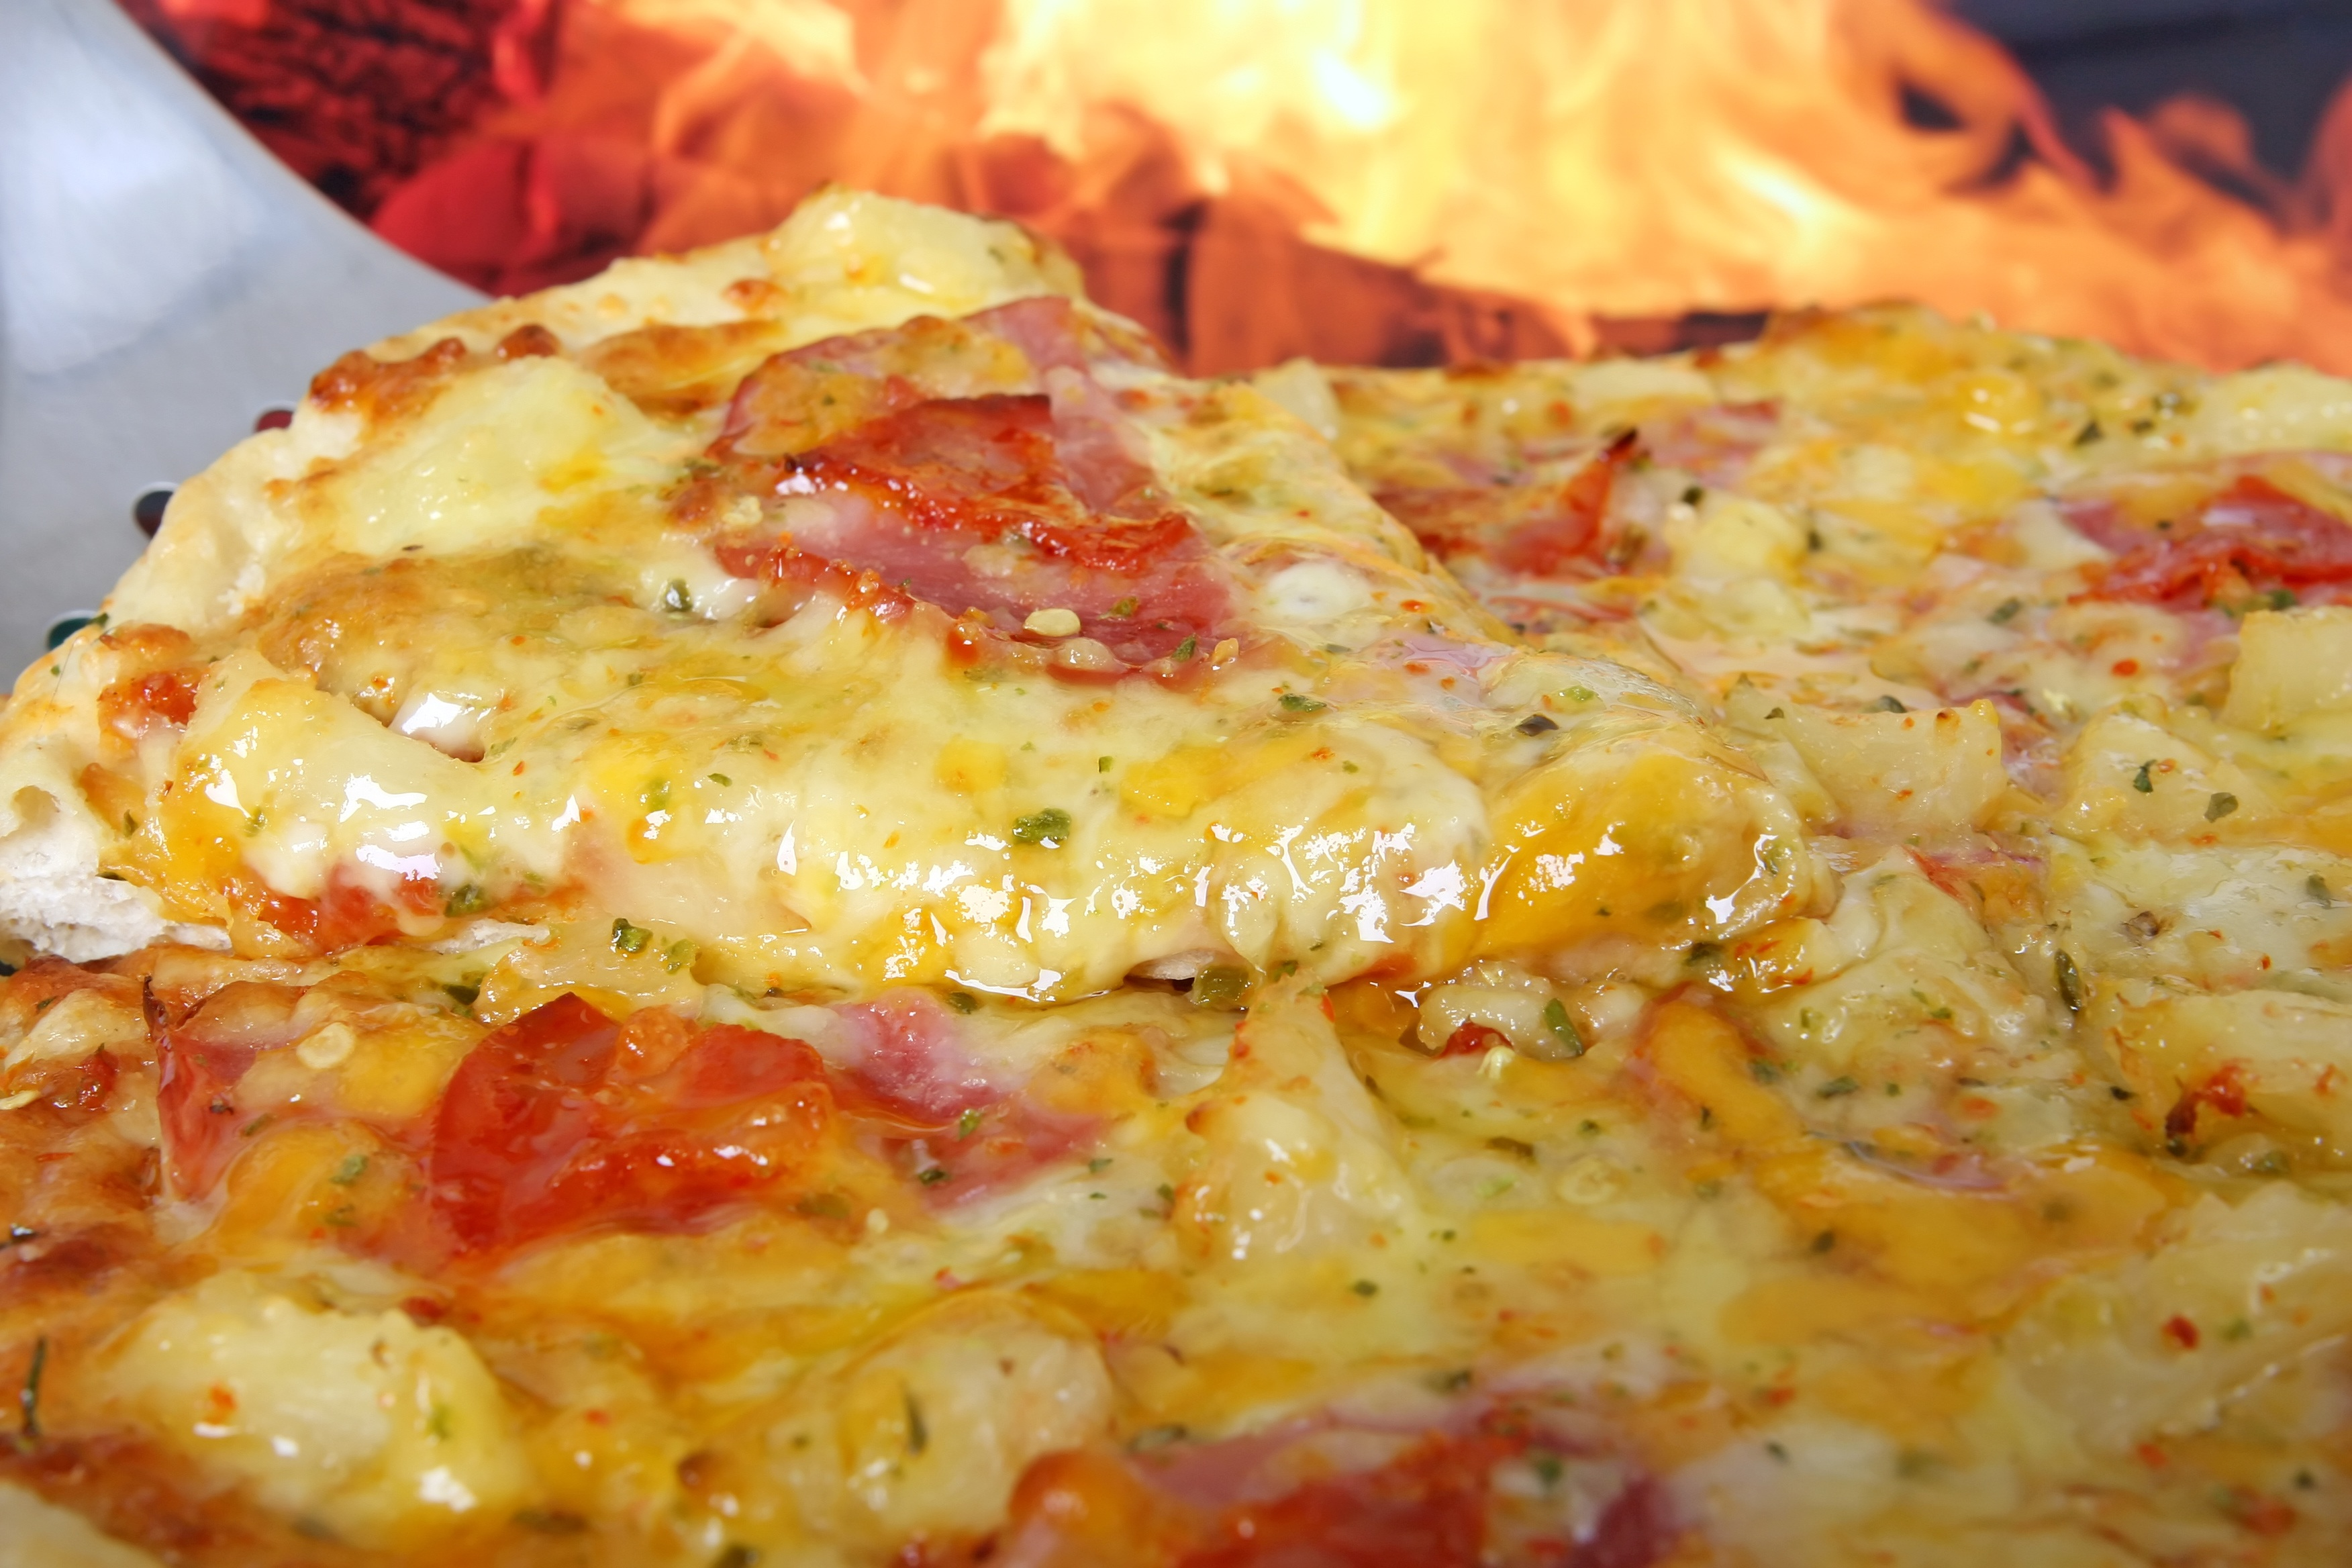 Hot, Fresh, Pizza, Food, Cheese, HQ Photo